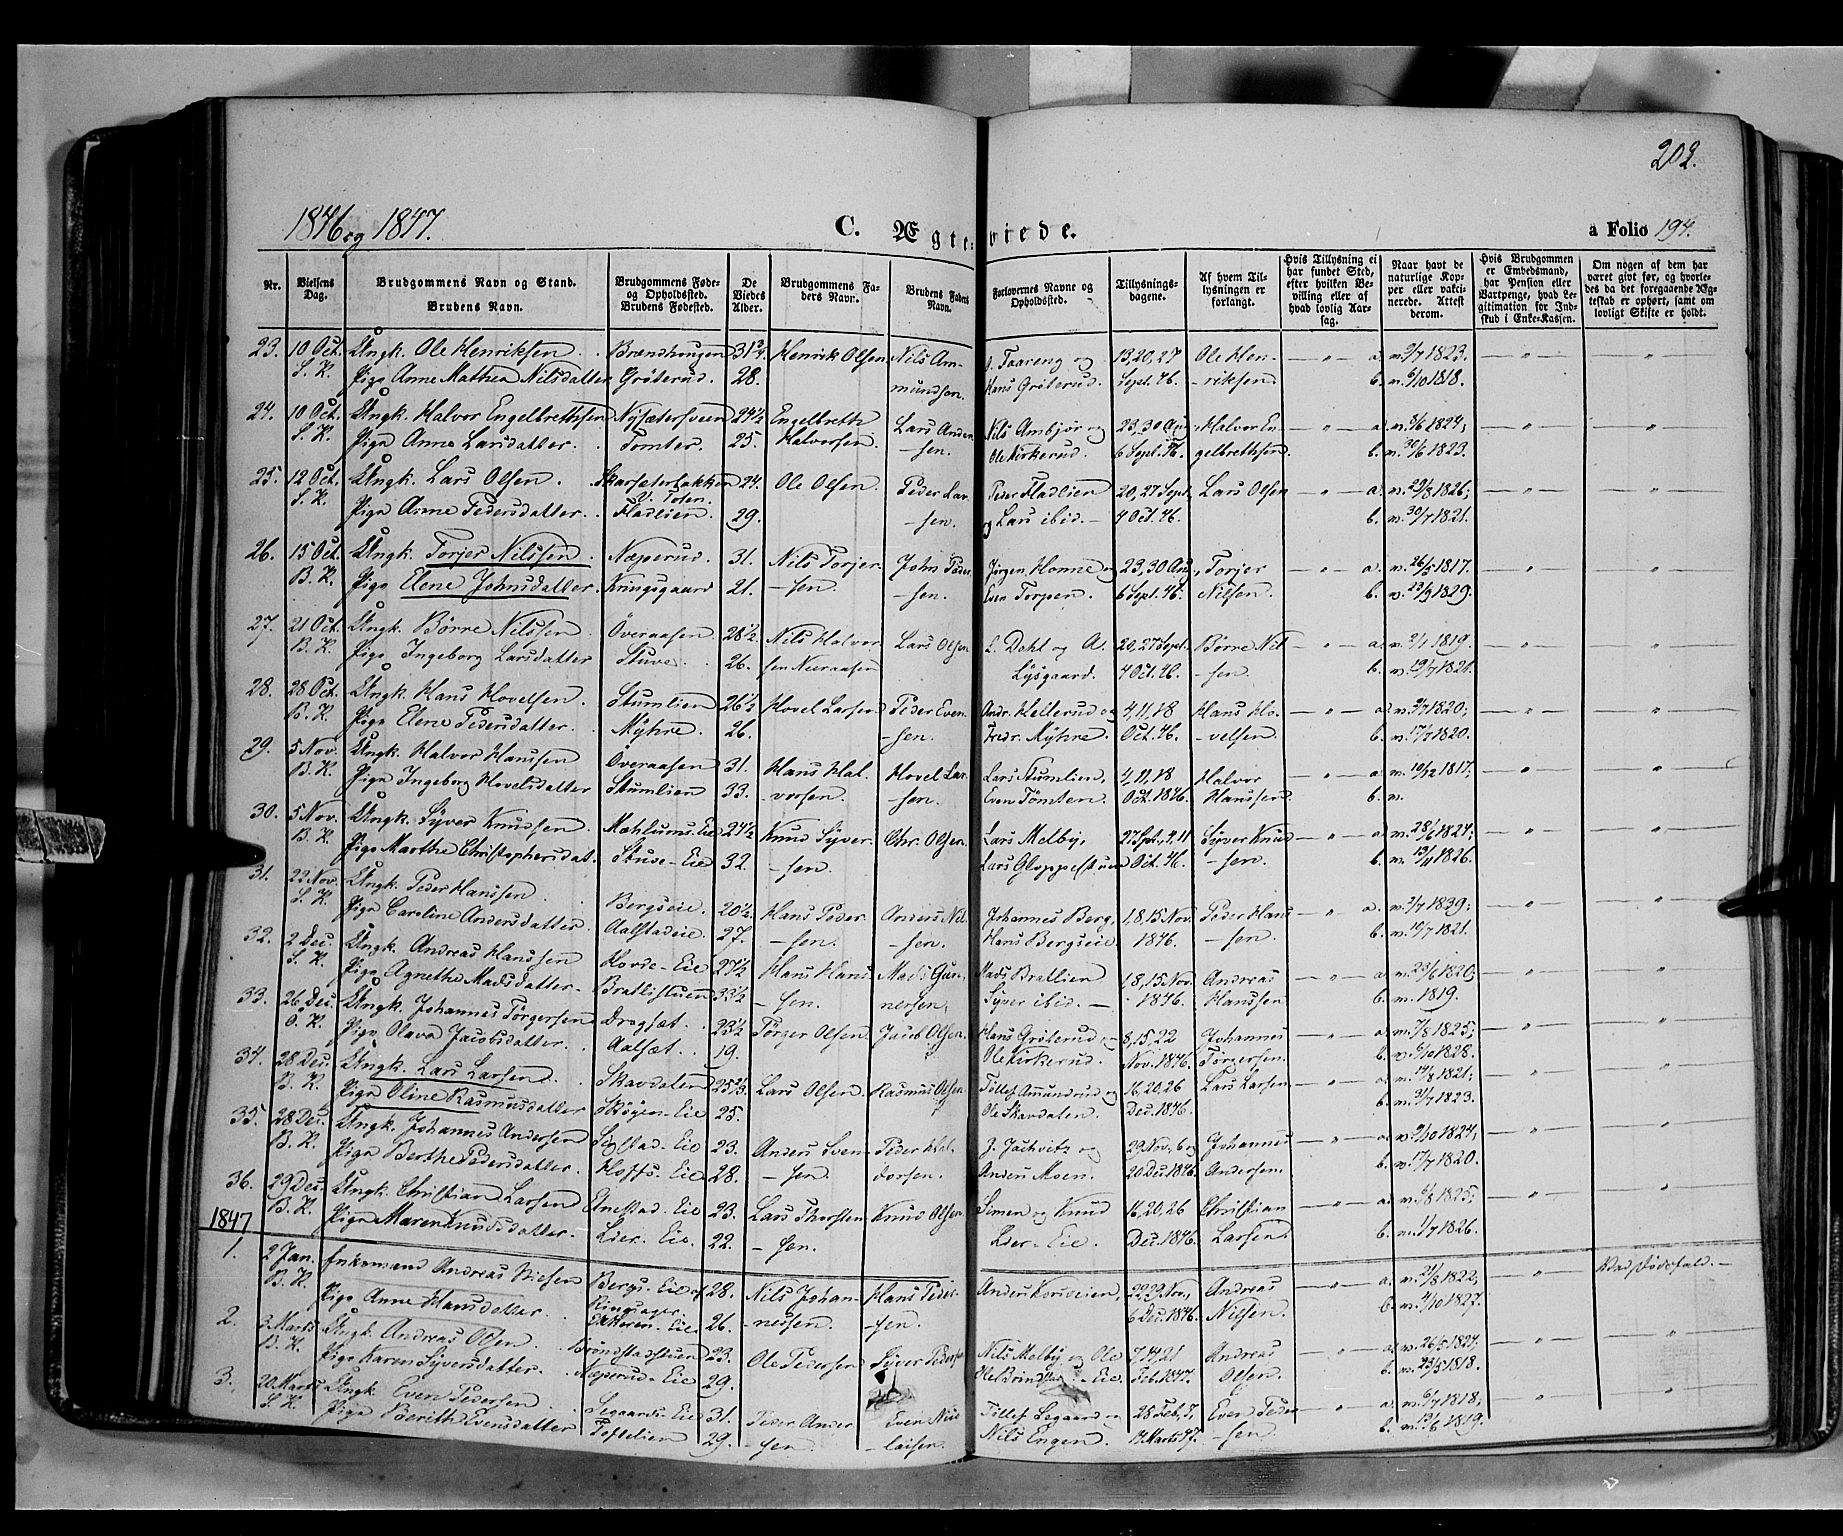 SAH, Biri prestekontor, Ministerialbok nr. 5, 1843-1854, s. 202